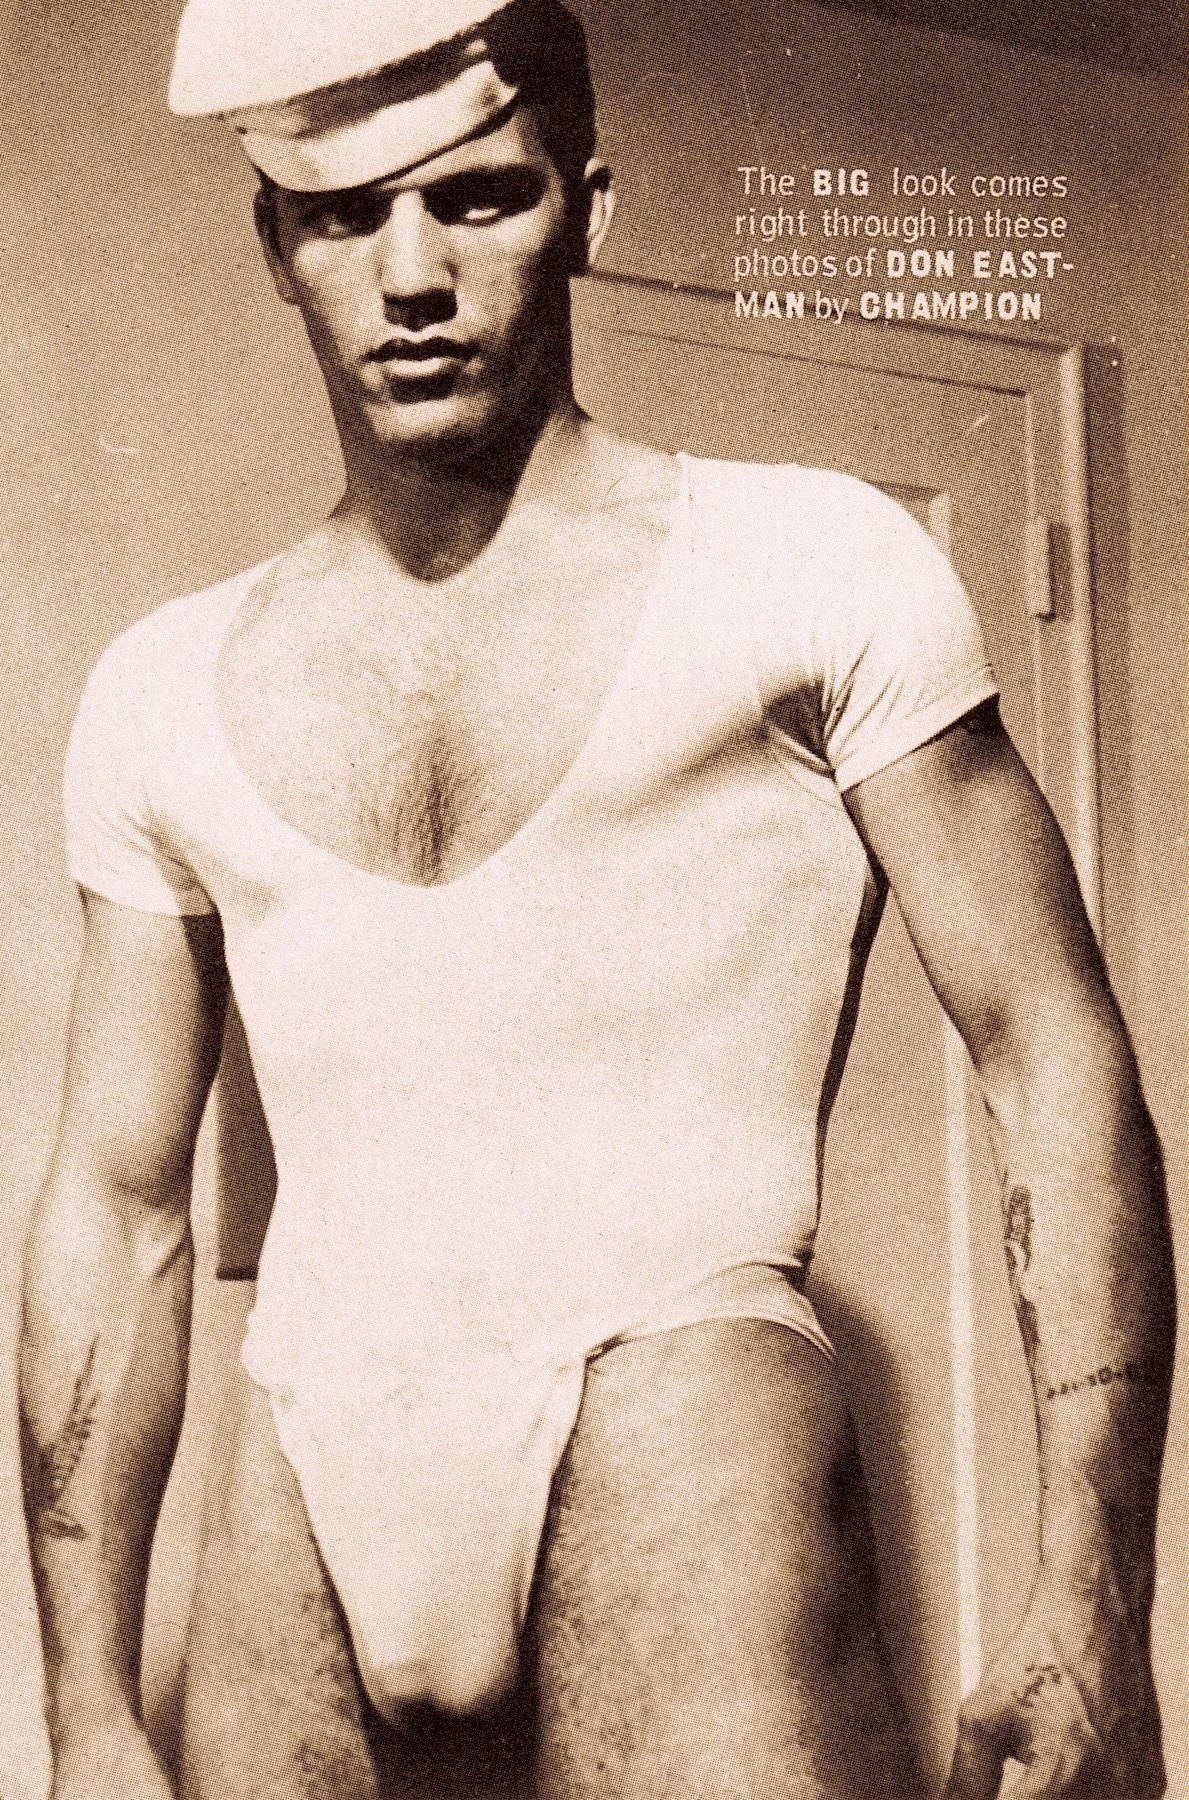 DON EASTMAN in Boys 1965. Vintage beefcake sailor